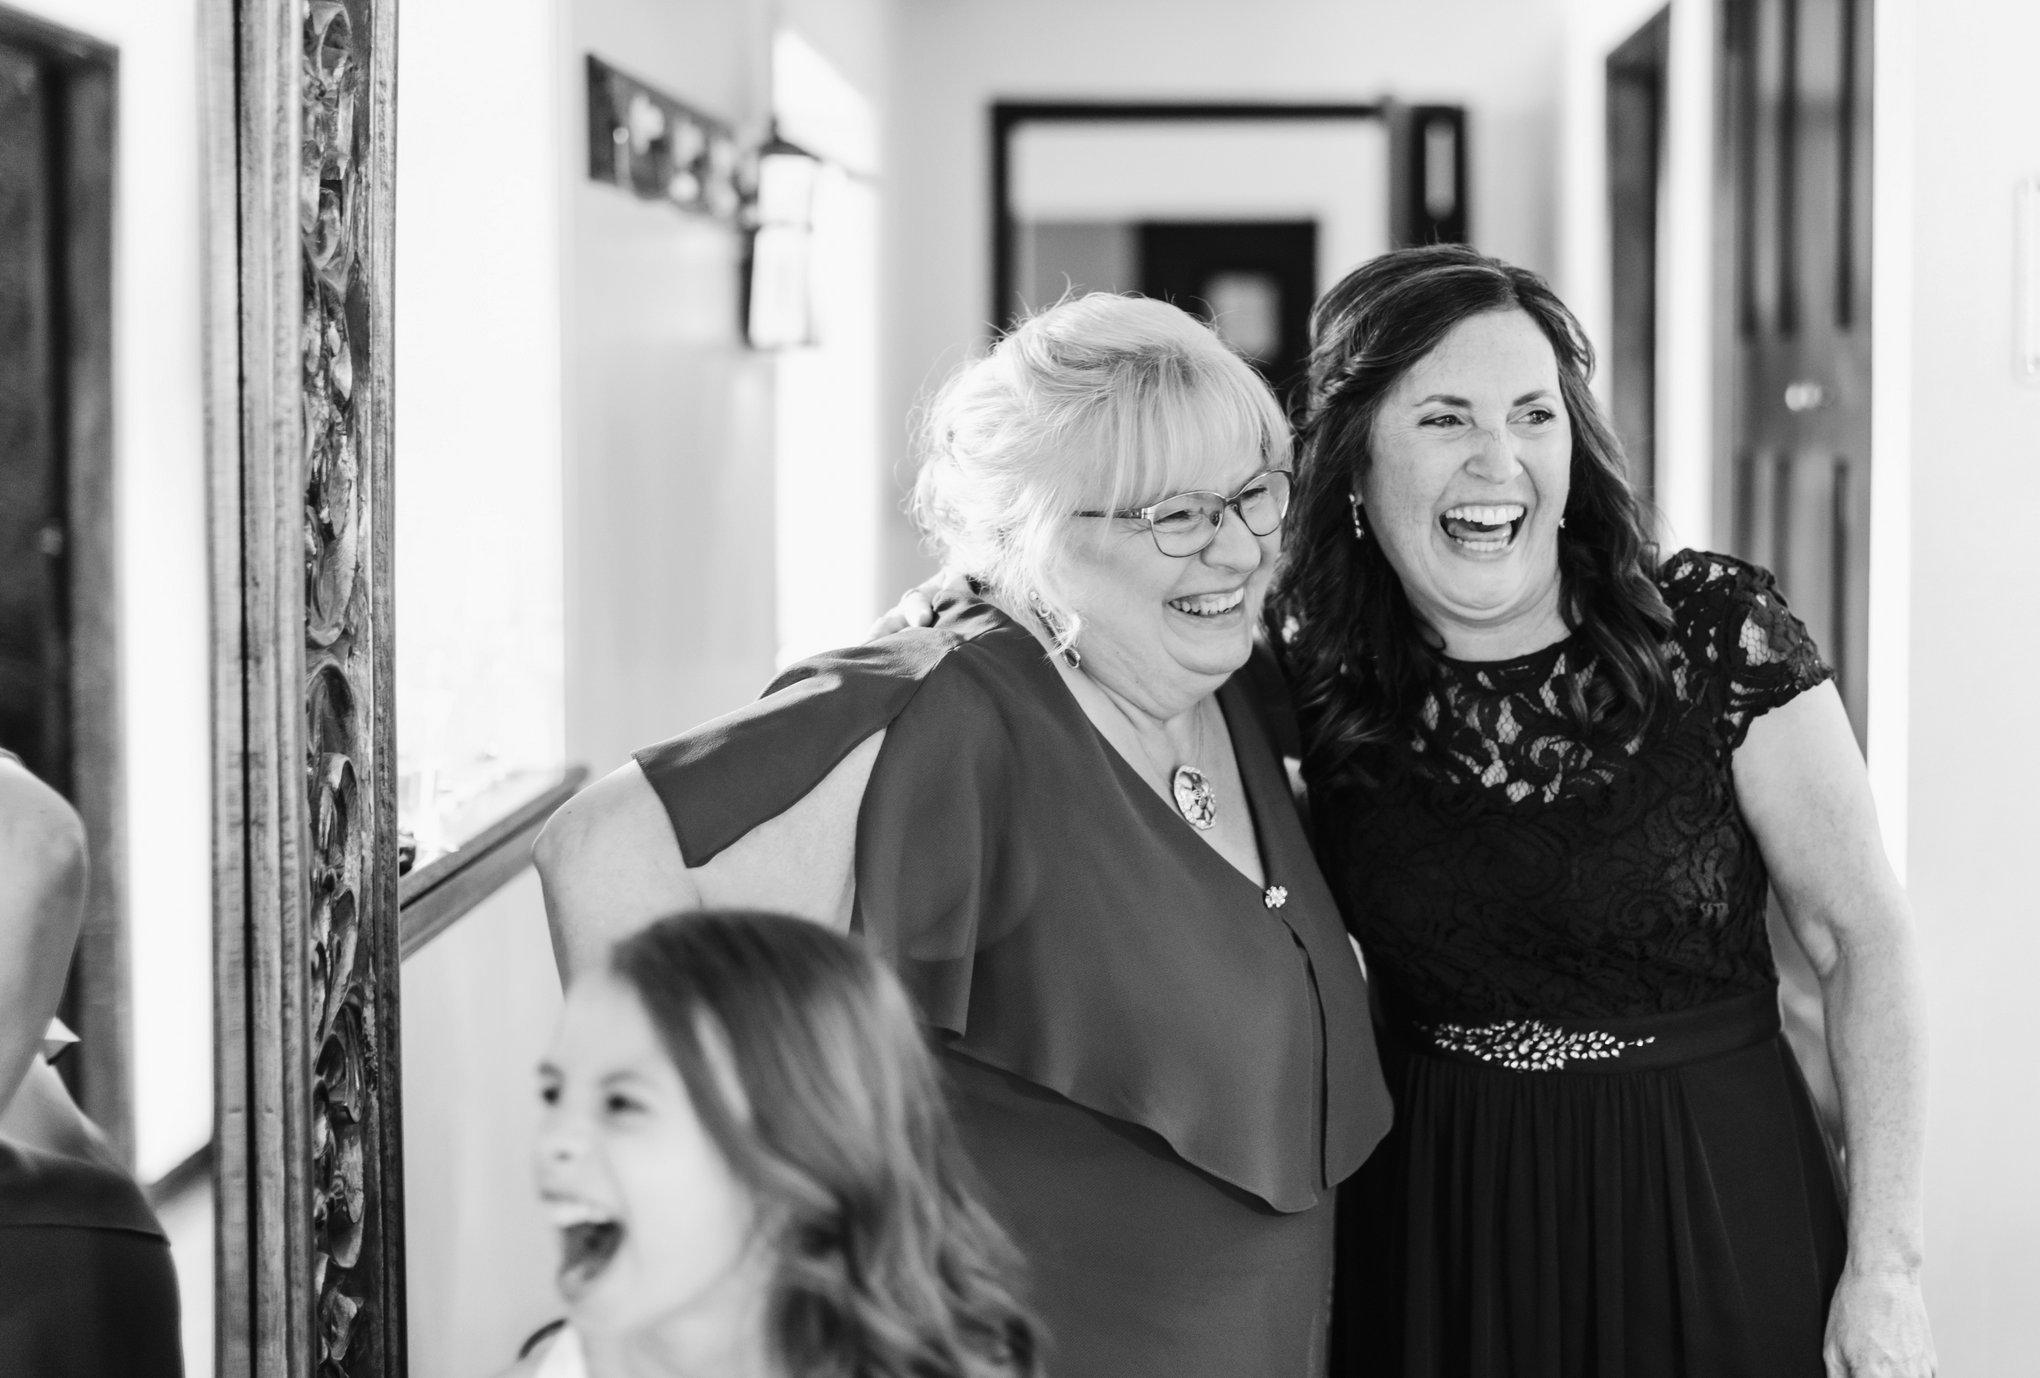 Lena_Mirisola_2017_Weddings_-031.jpg